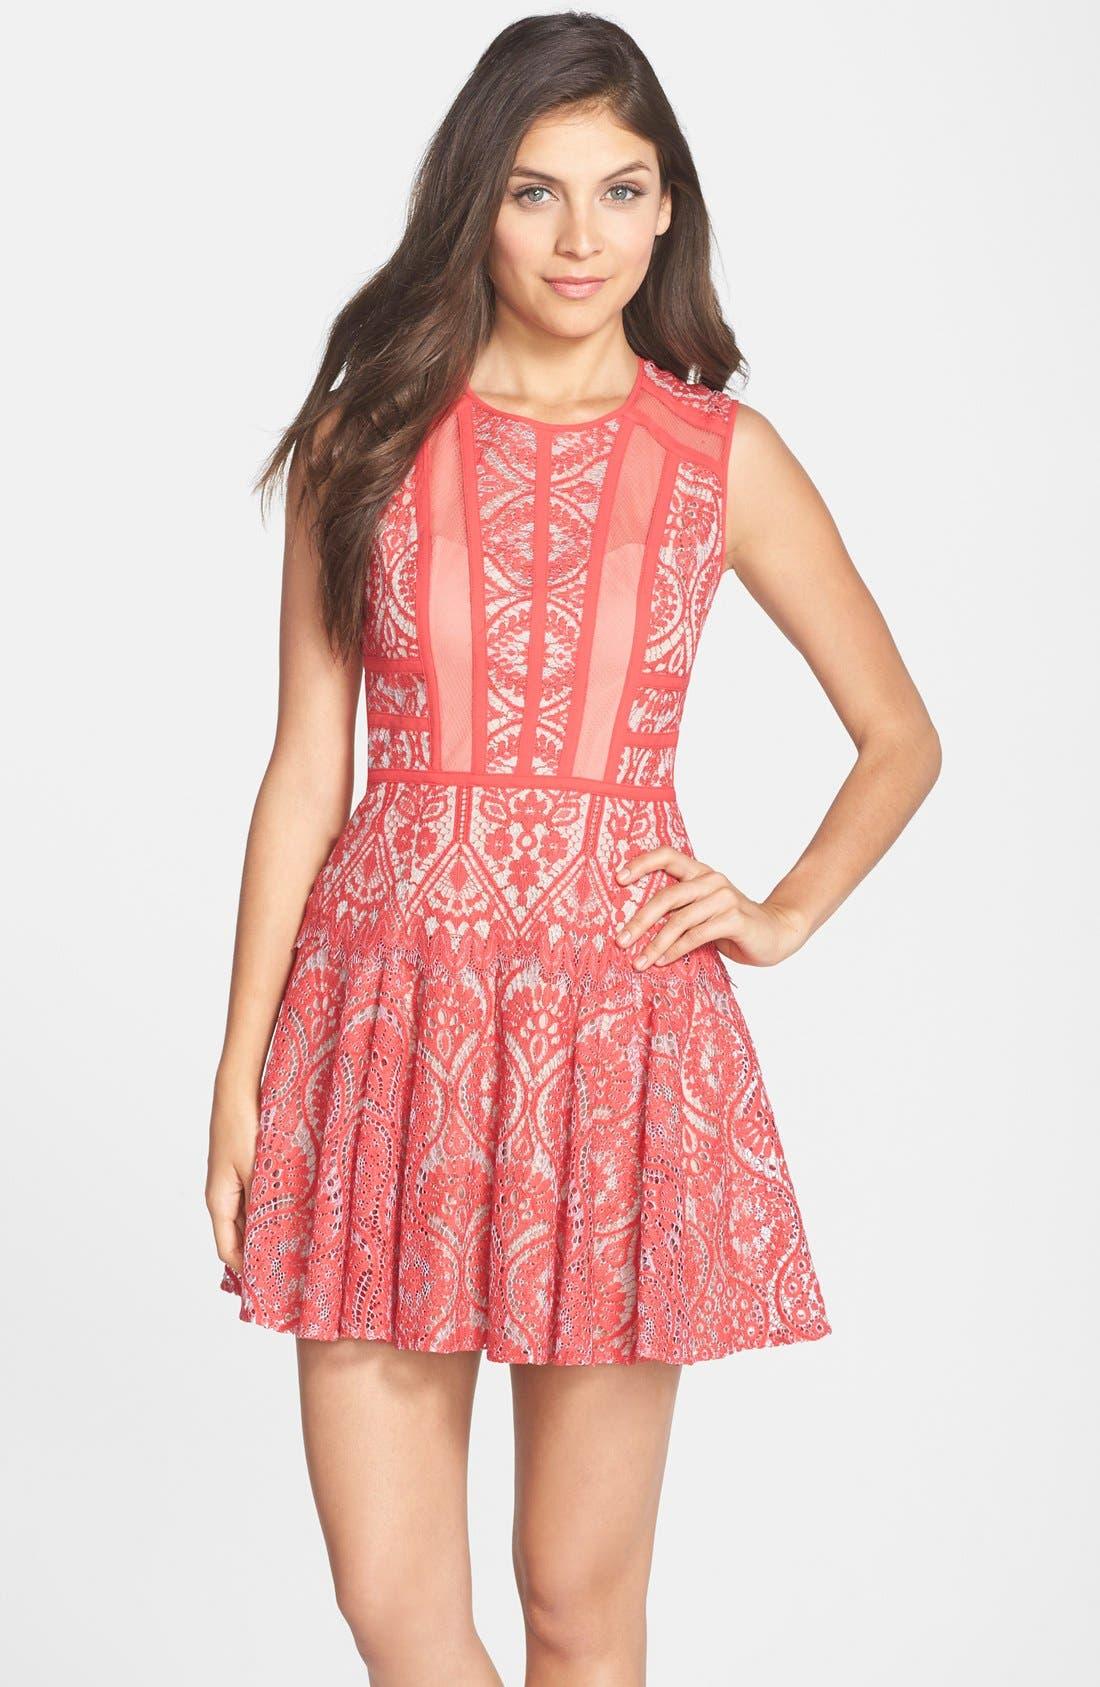 Main Image - BCBGMAXAZRIA 'Shira' Knit Lace Fit & Flare Dress